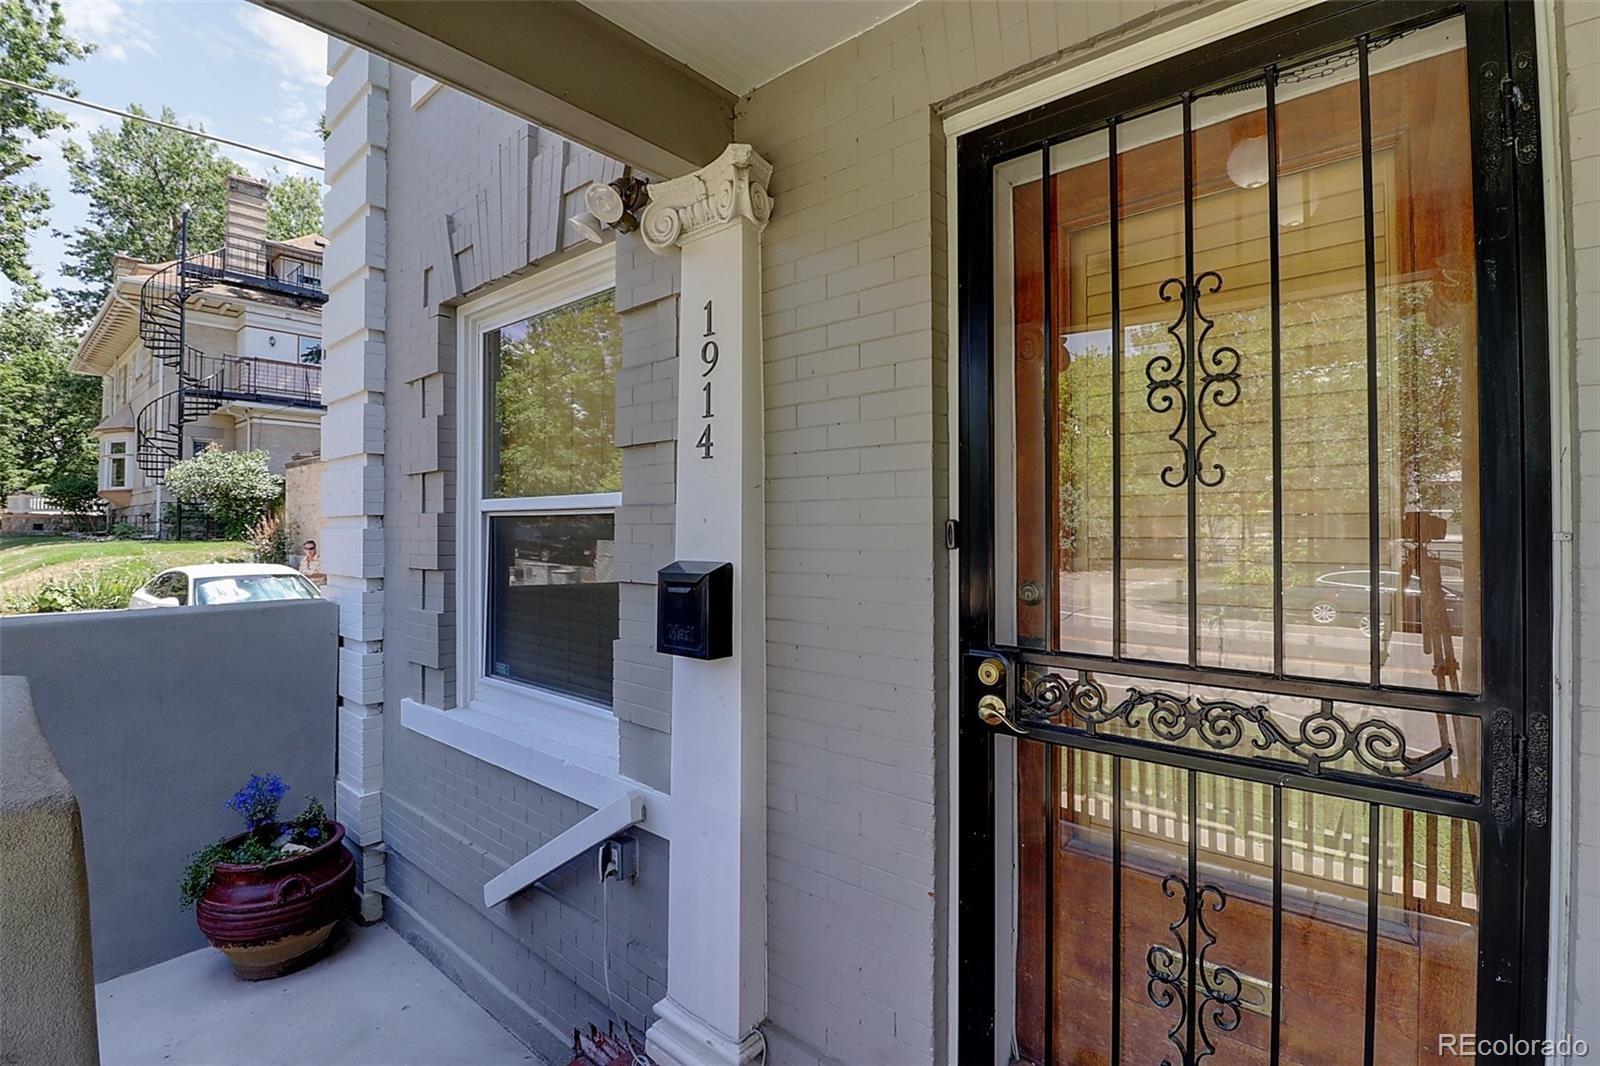 MLS# 2698022 - 2 - 1914 E 16th Avenue, Denver, CO 80206